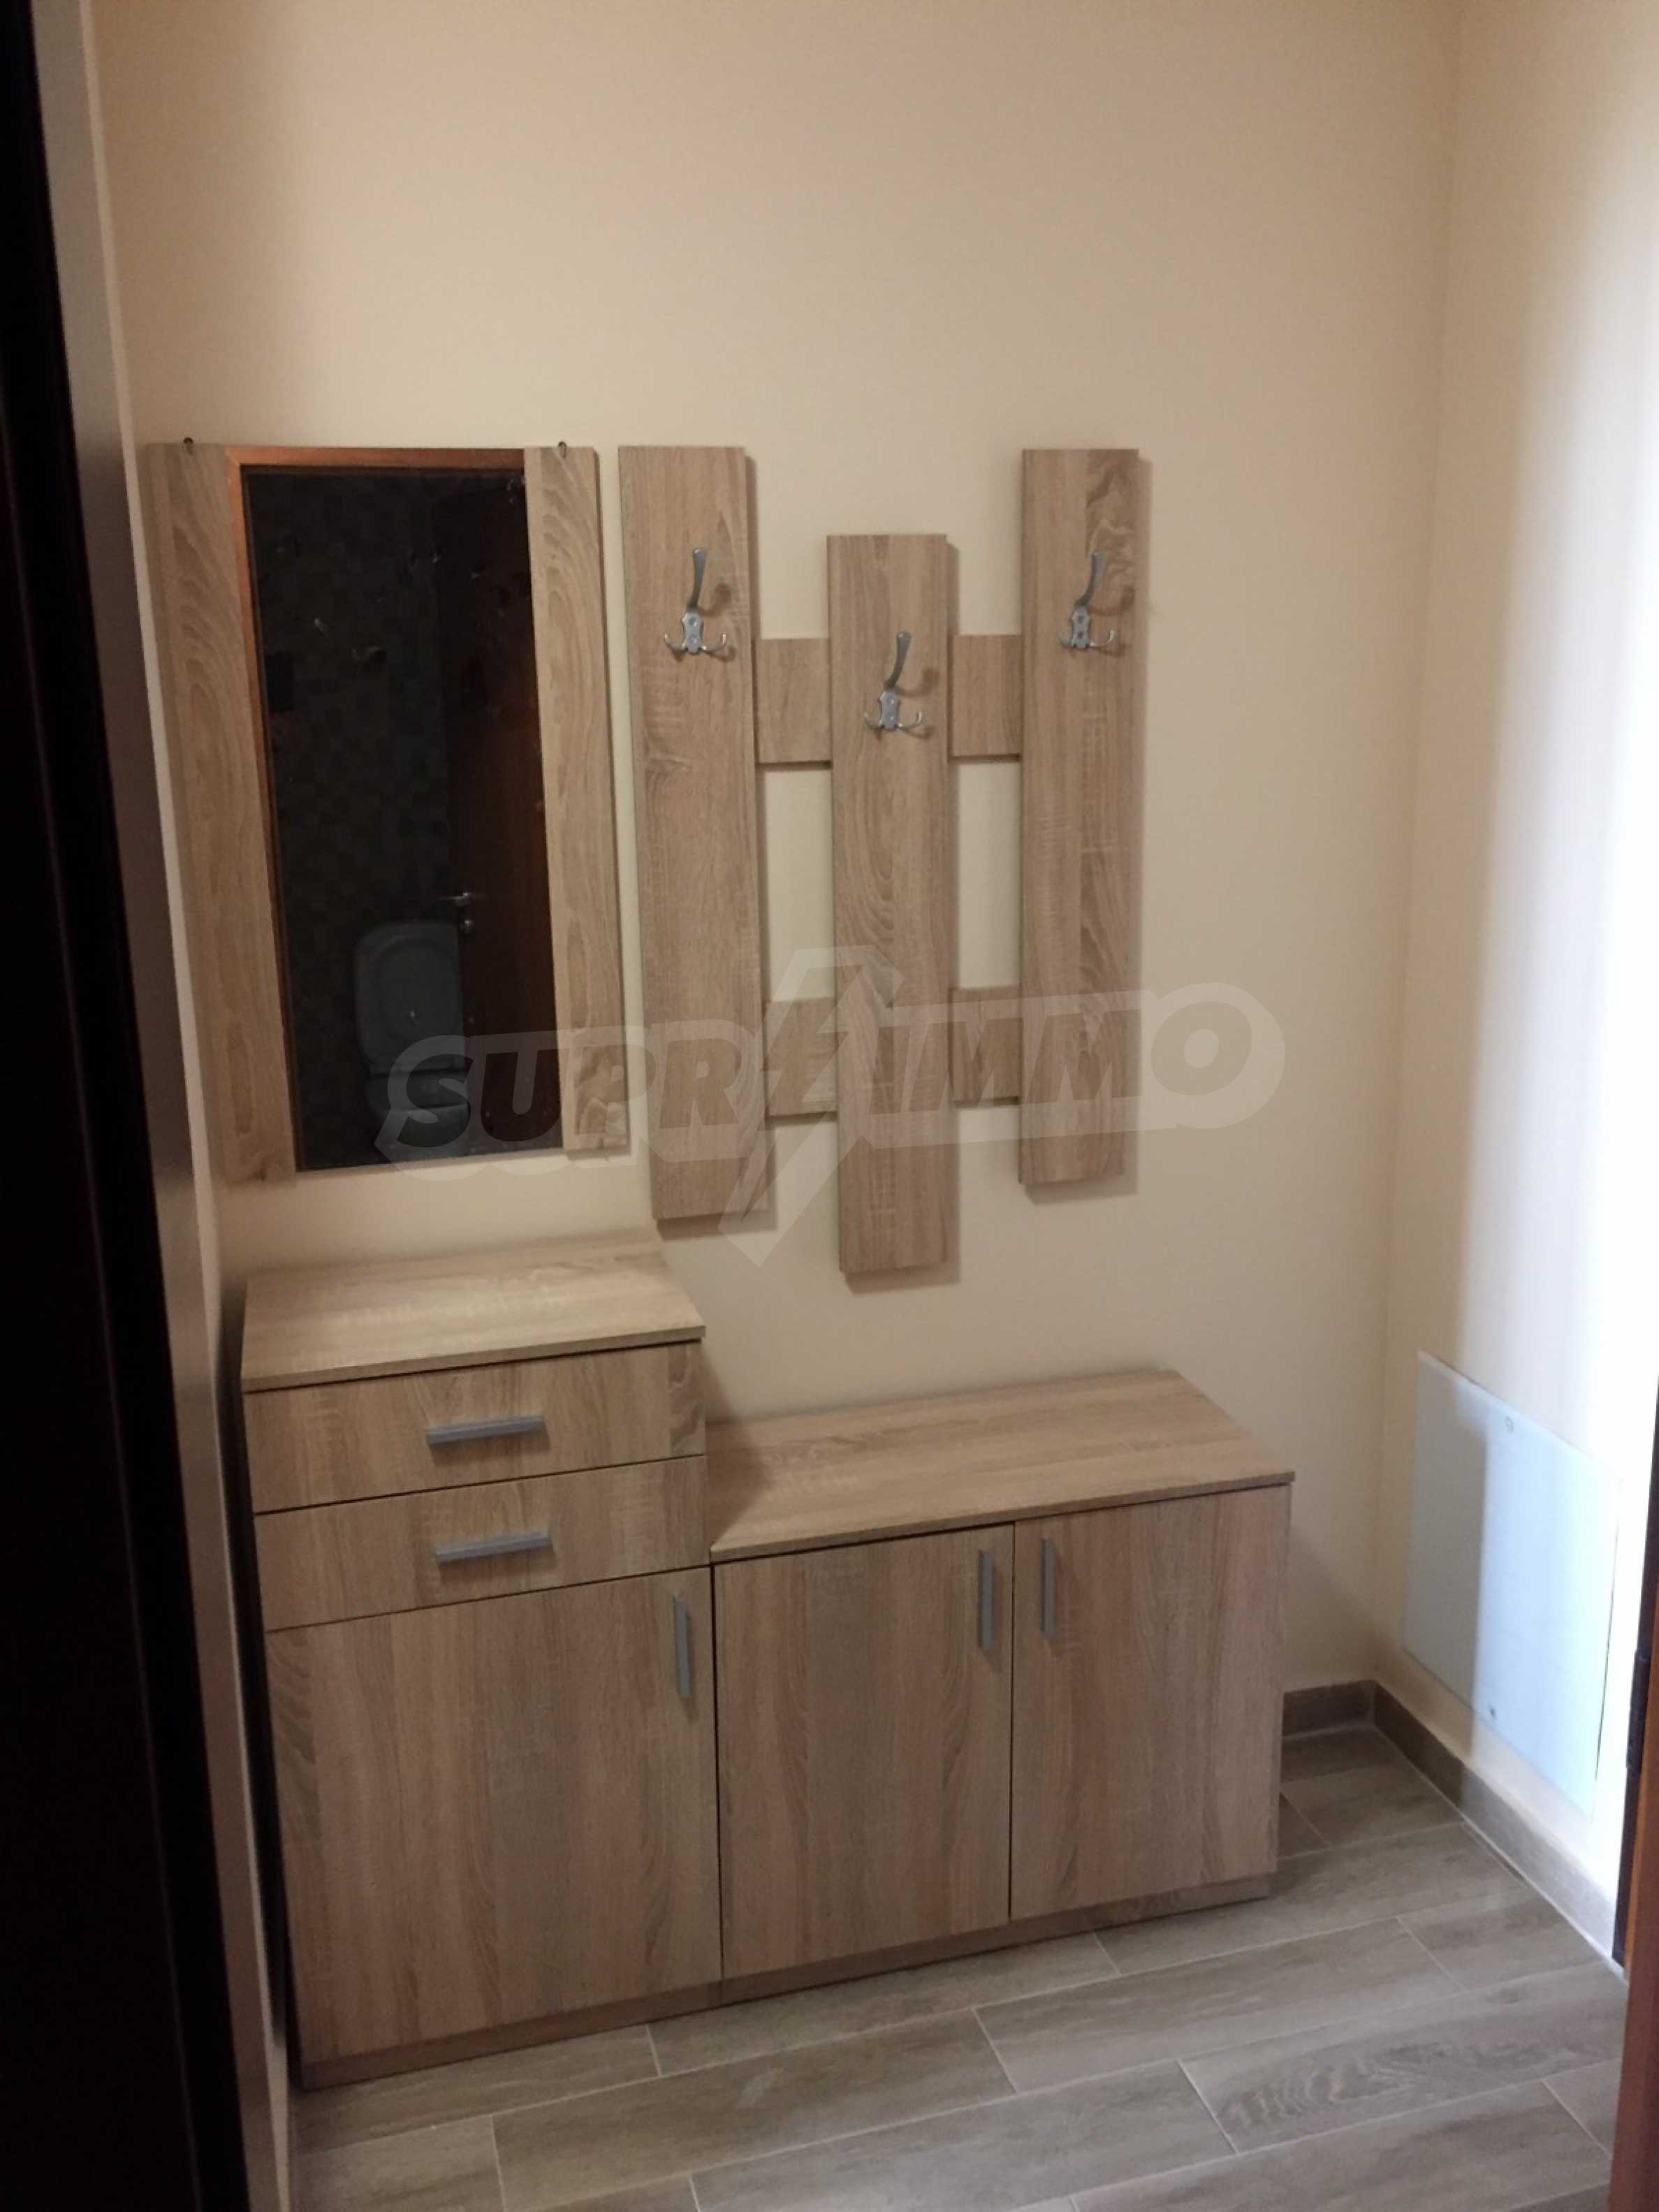 Cozy, one-bedroom apartment for rent in Studentski grad near NSA 5